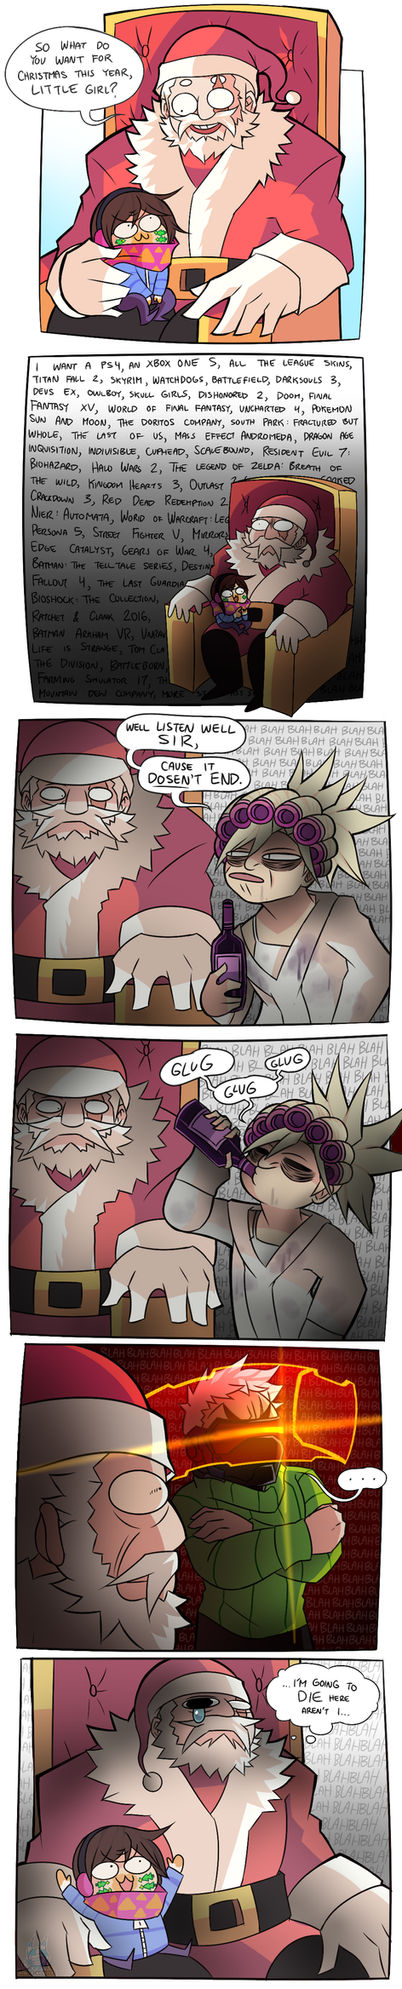 Over Christmas by Wowza-Wowzers